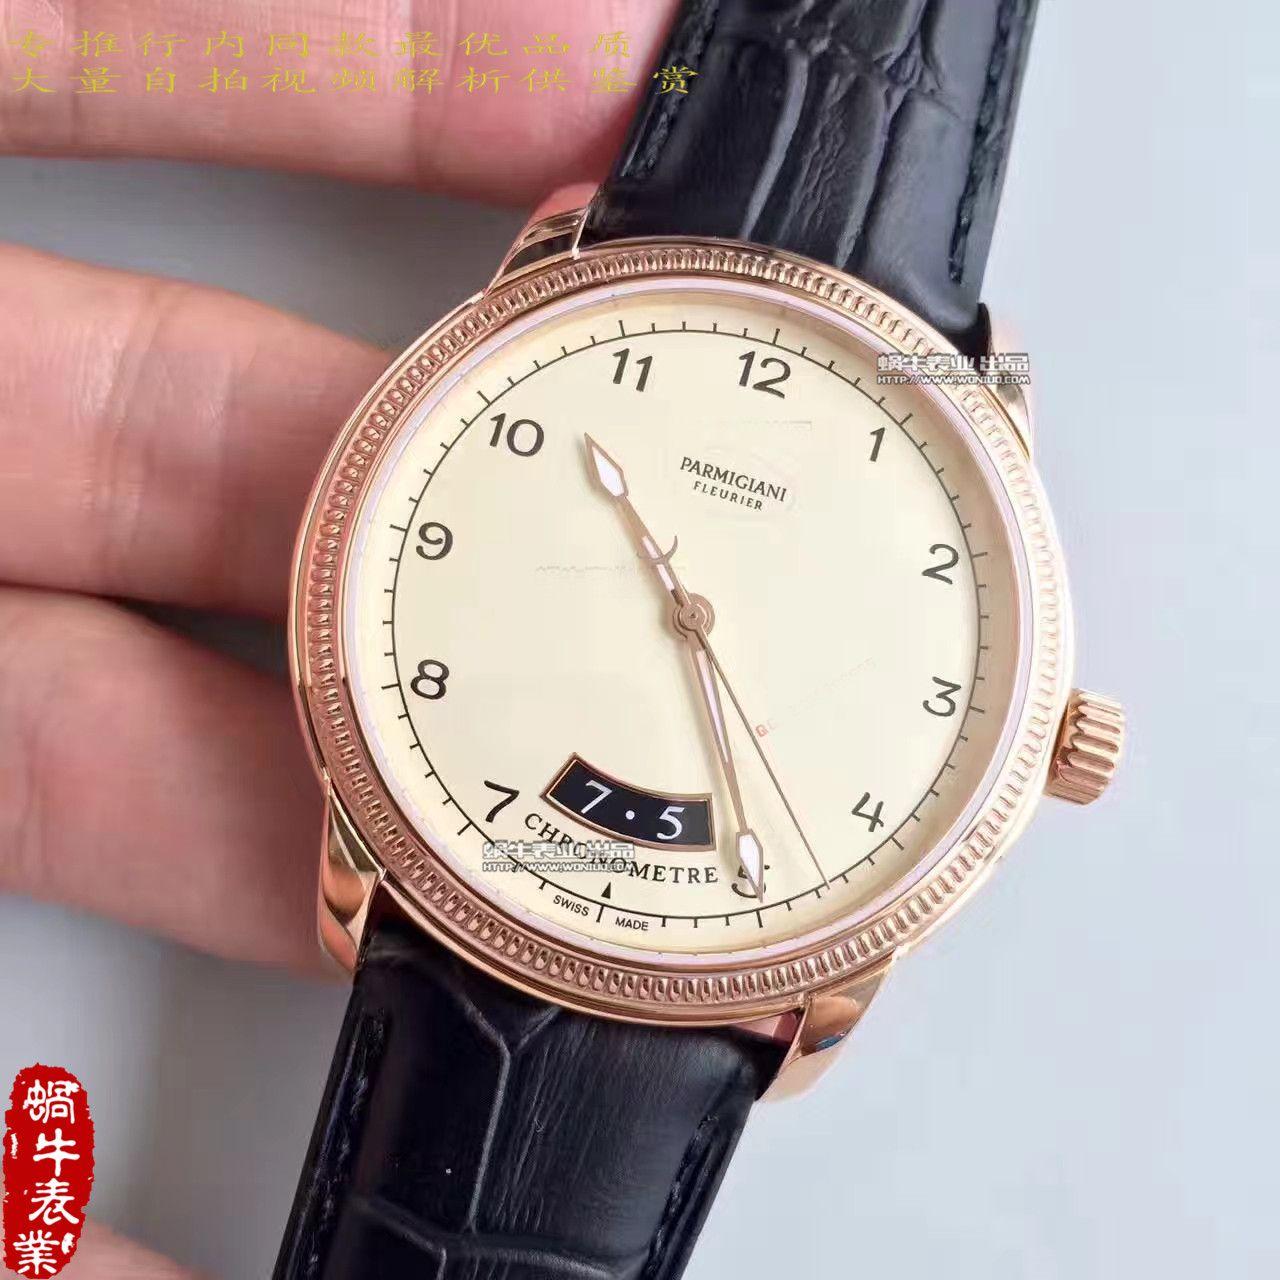 【WF一比一顶级复刻手表】帕玛强尼TORIC系列PFC423-1602400-HA1441腕表